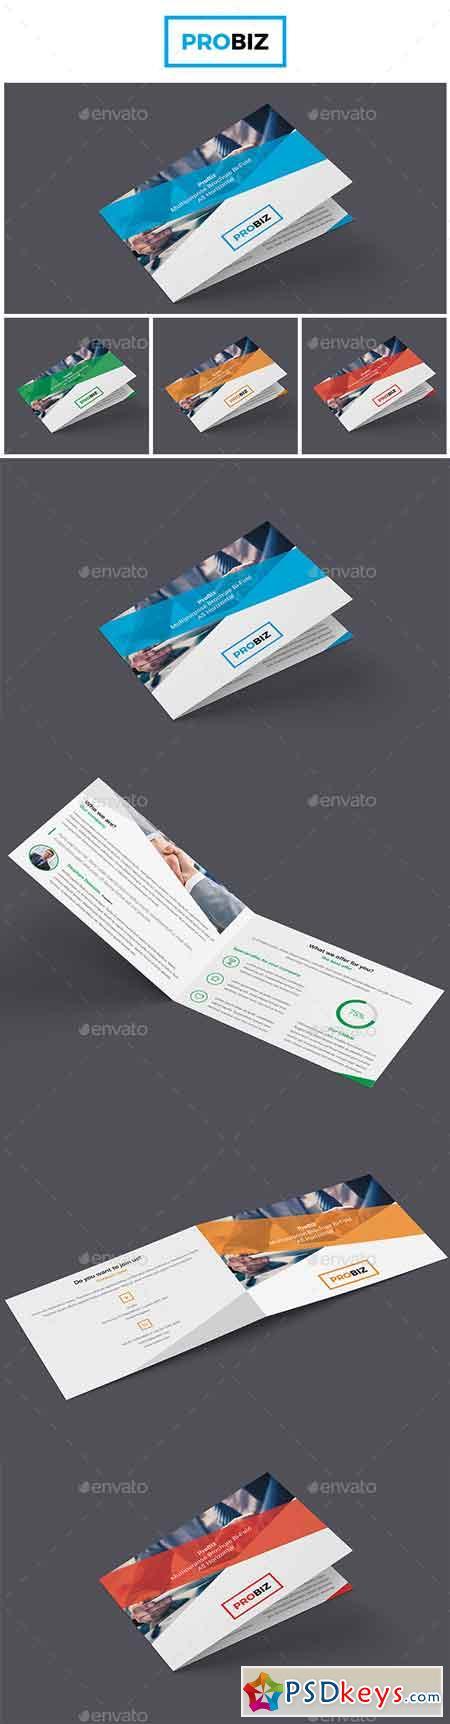 ProBiz - Business and Corporate Brochure Bi-Fold A5 Horizontal 19131278